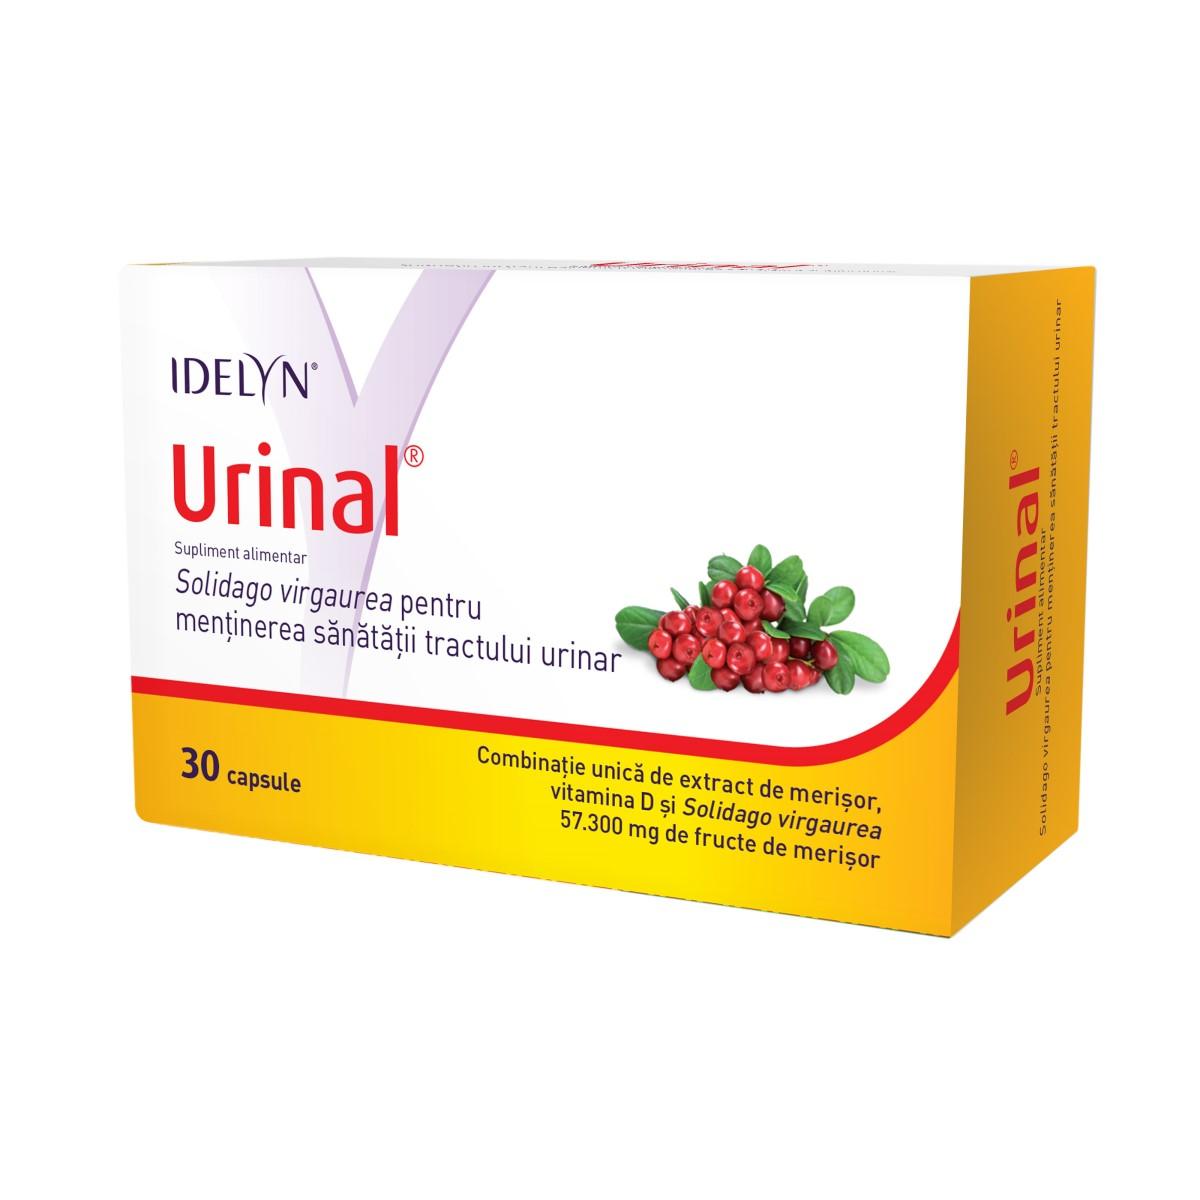 Urinal, 30 capsule, Walmark